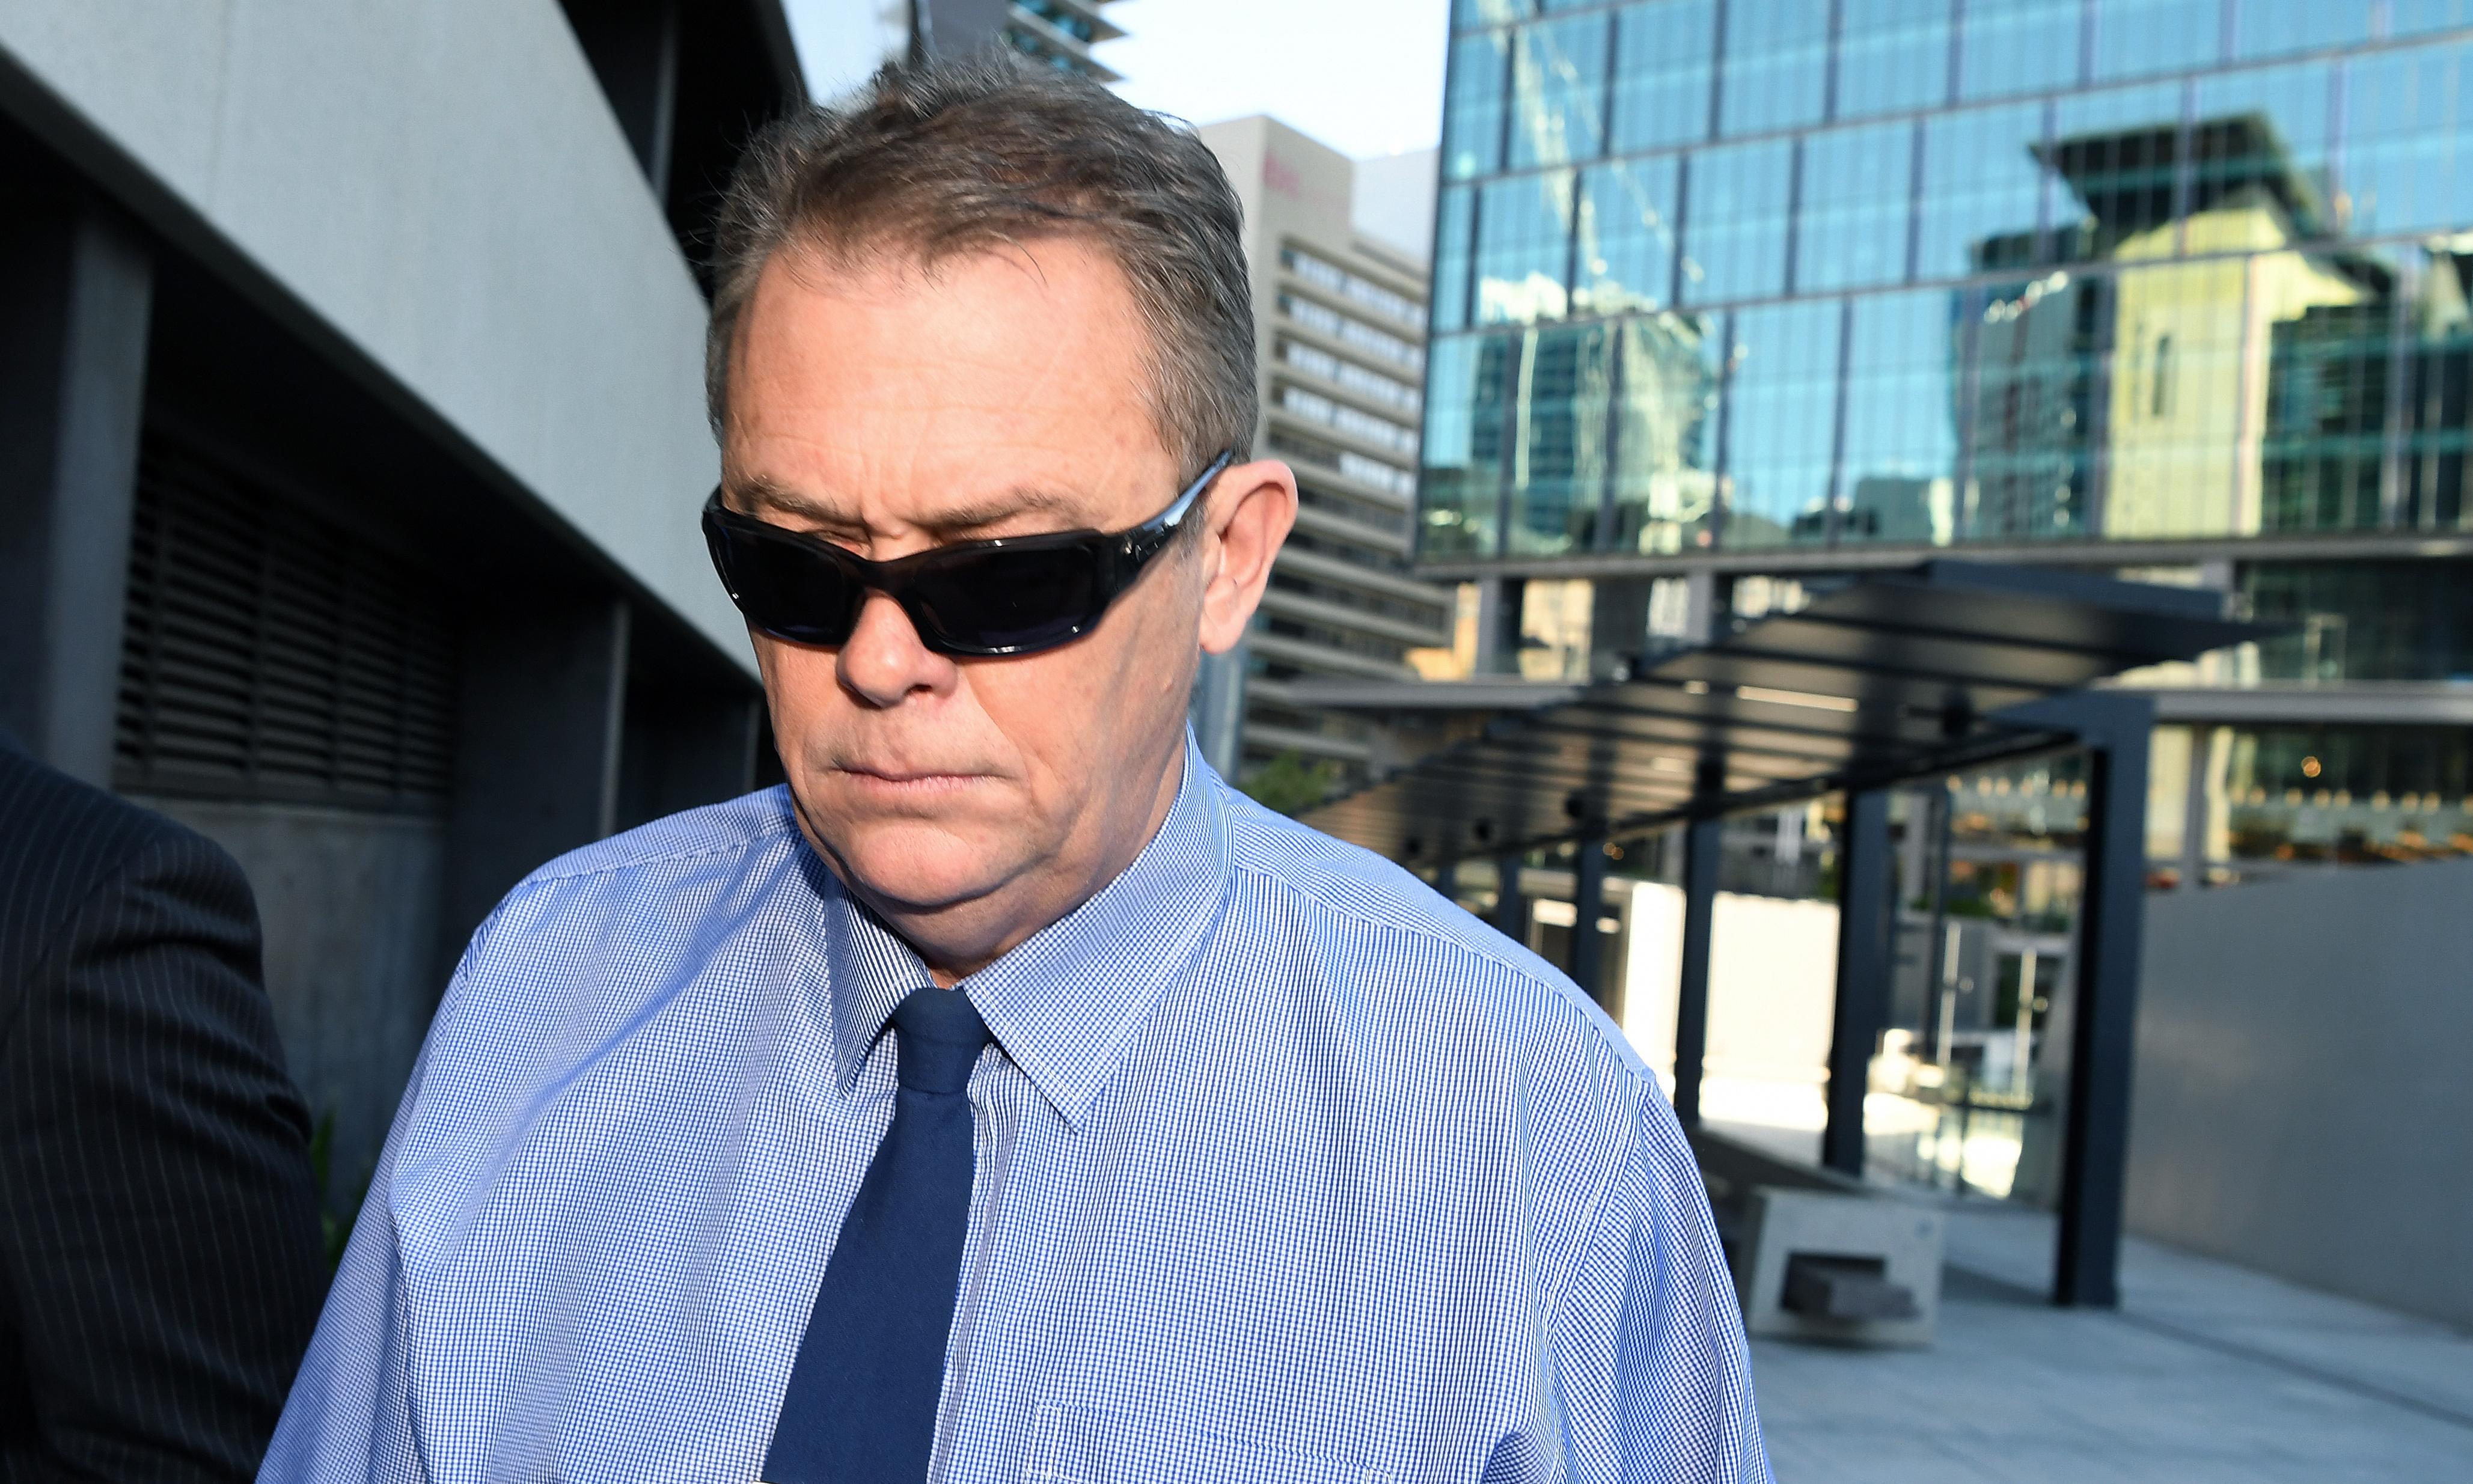 Queensland police officer receives suspended jail sentence for leaking woman's details to violent ex-husband